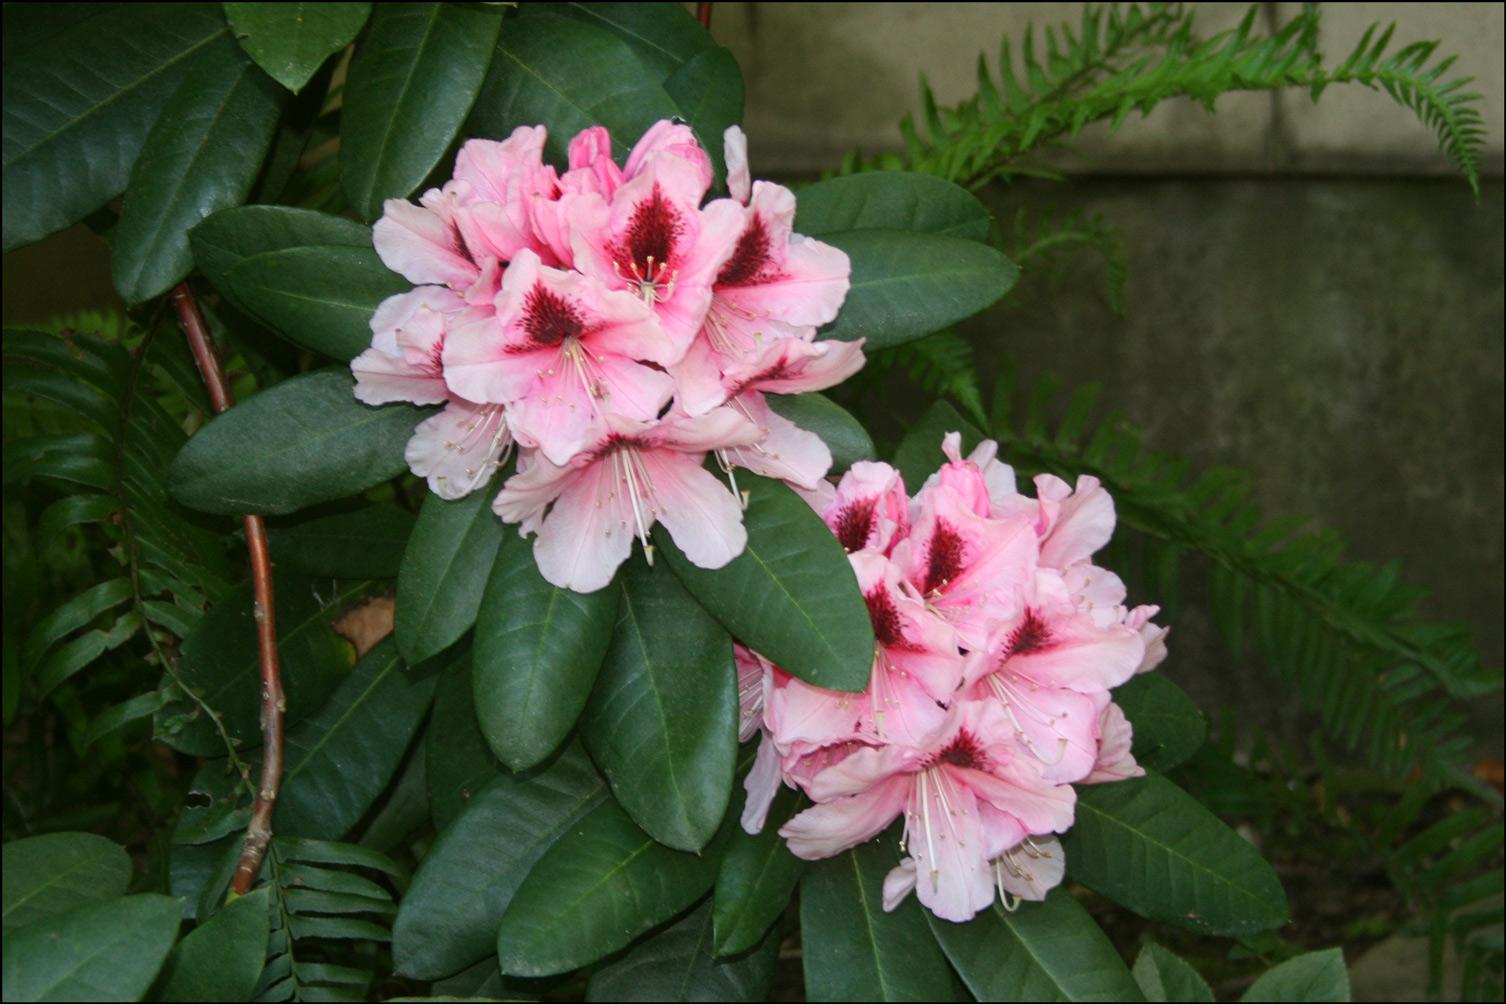 Rhododendron 'Mrs. G. W. Leak'